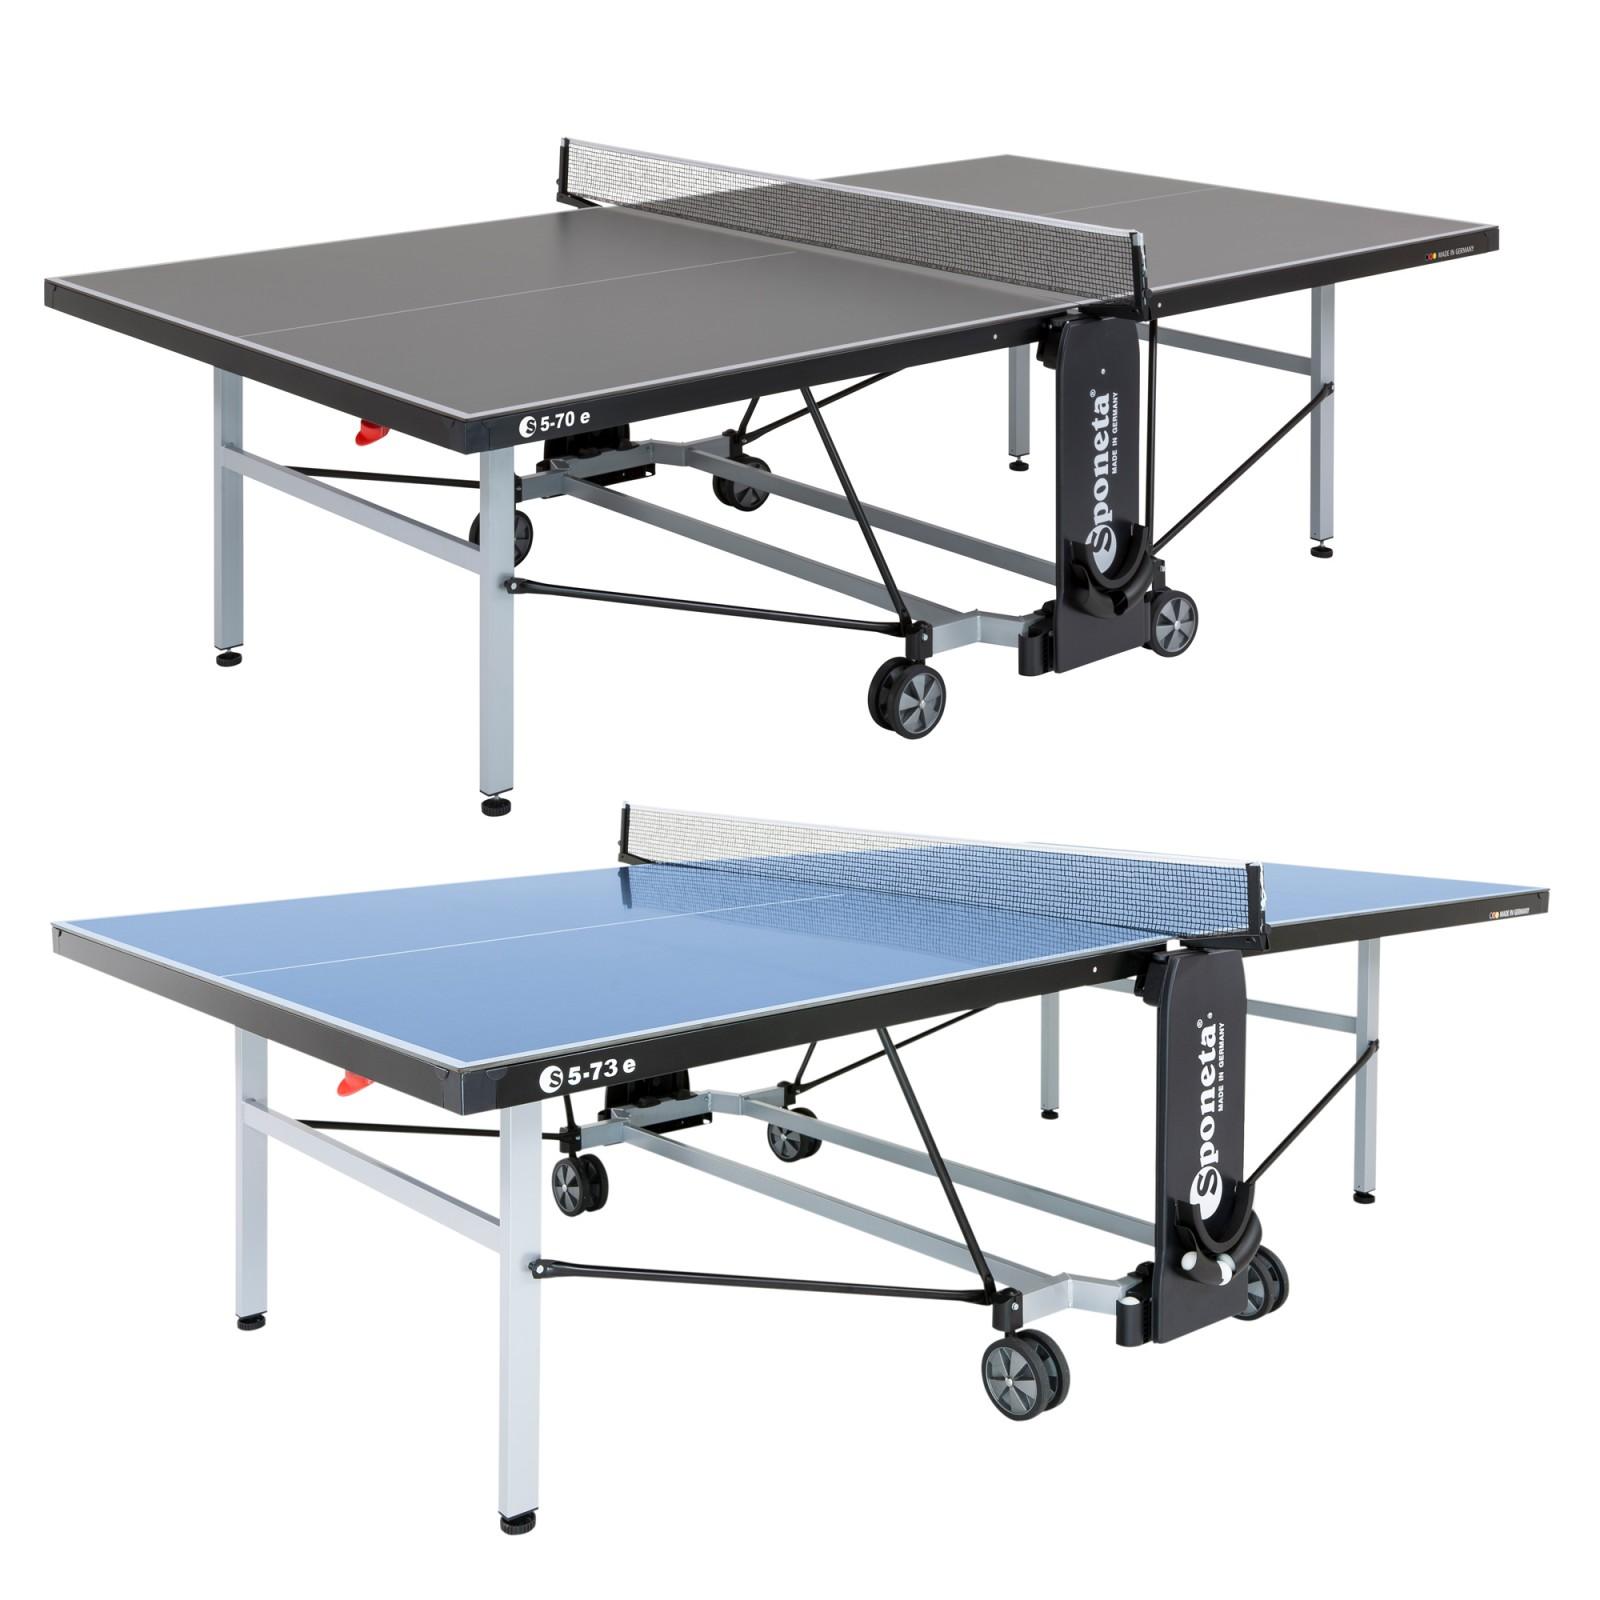 eb0db0eef Sponeta table tennis table S5-73e buy with 277 customer ratings ...